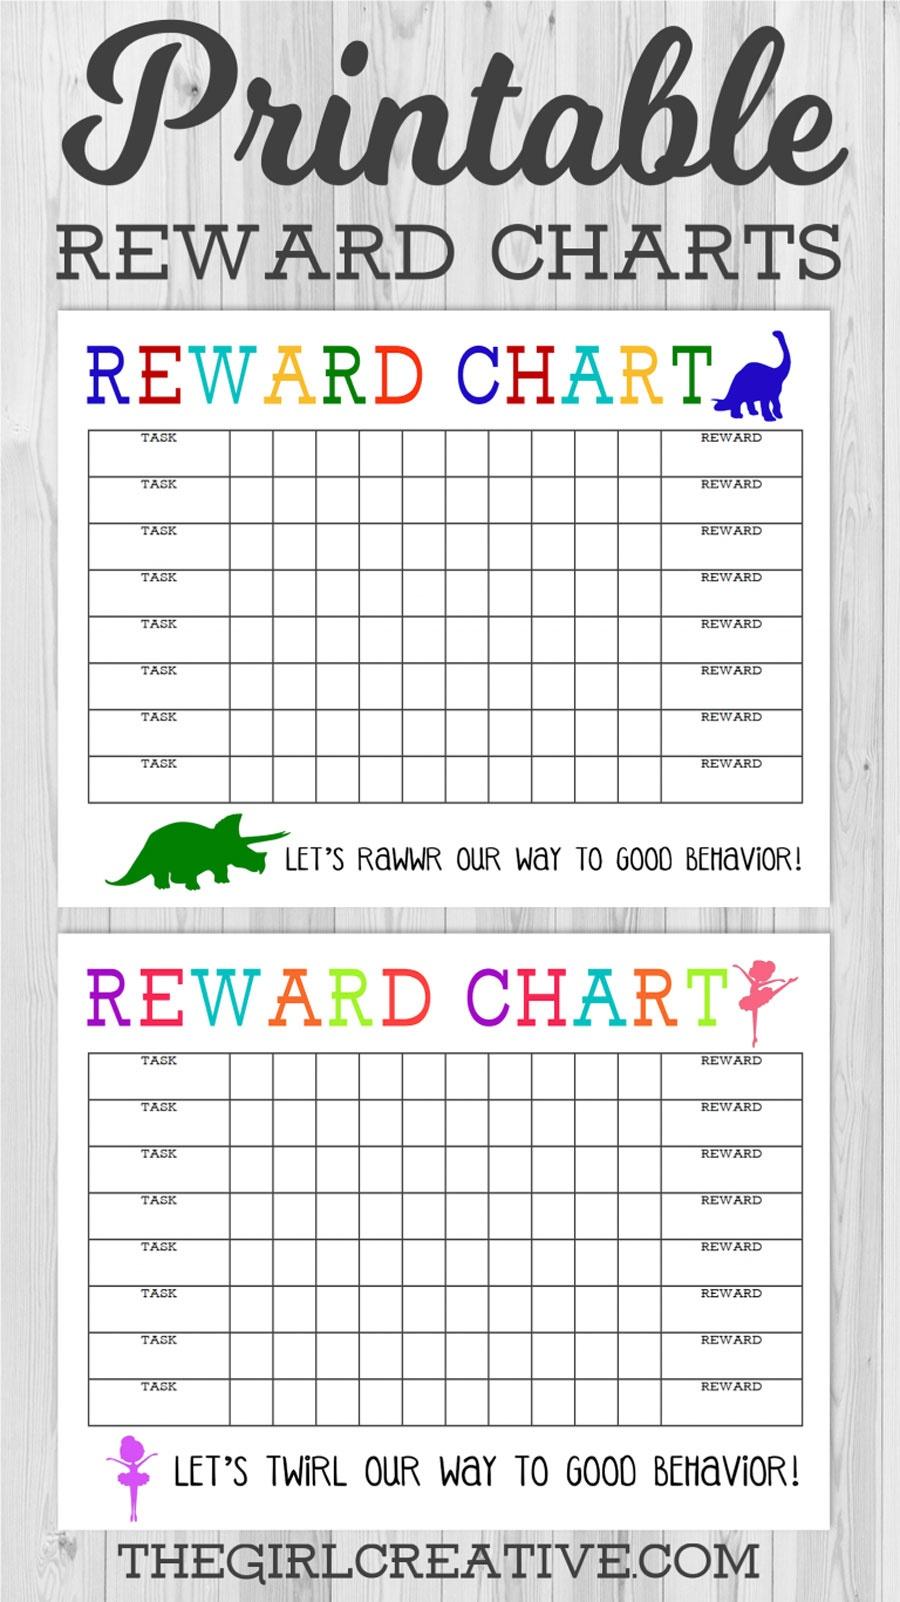 40 Printable Reward Charts For Kids (Pdf, Excel & Word) - Free Printable Sticker Charts